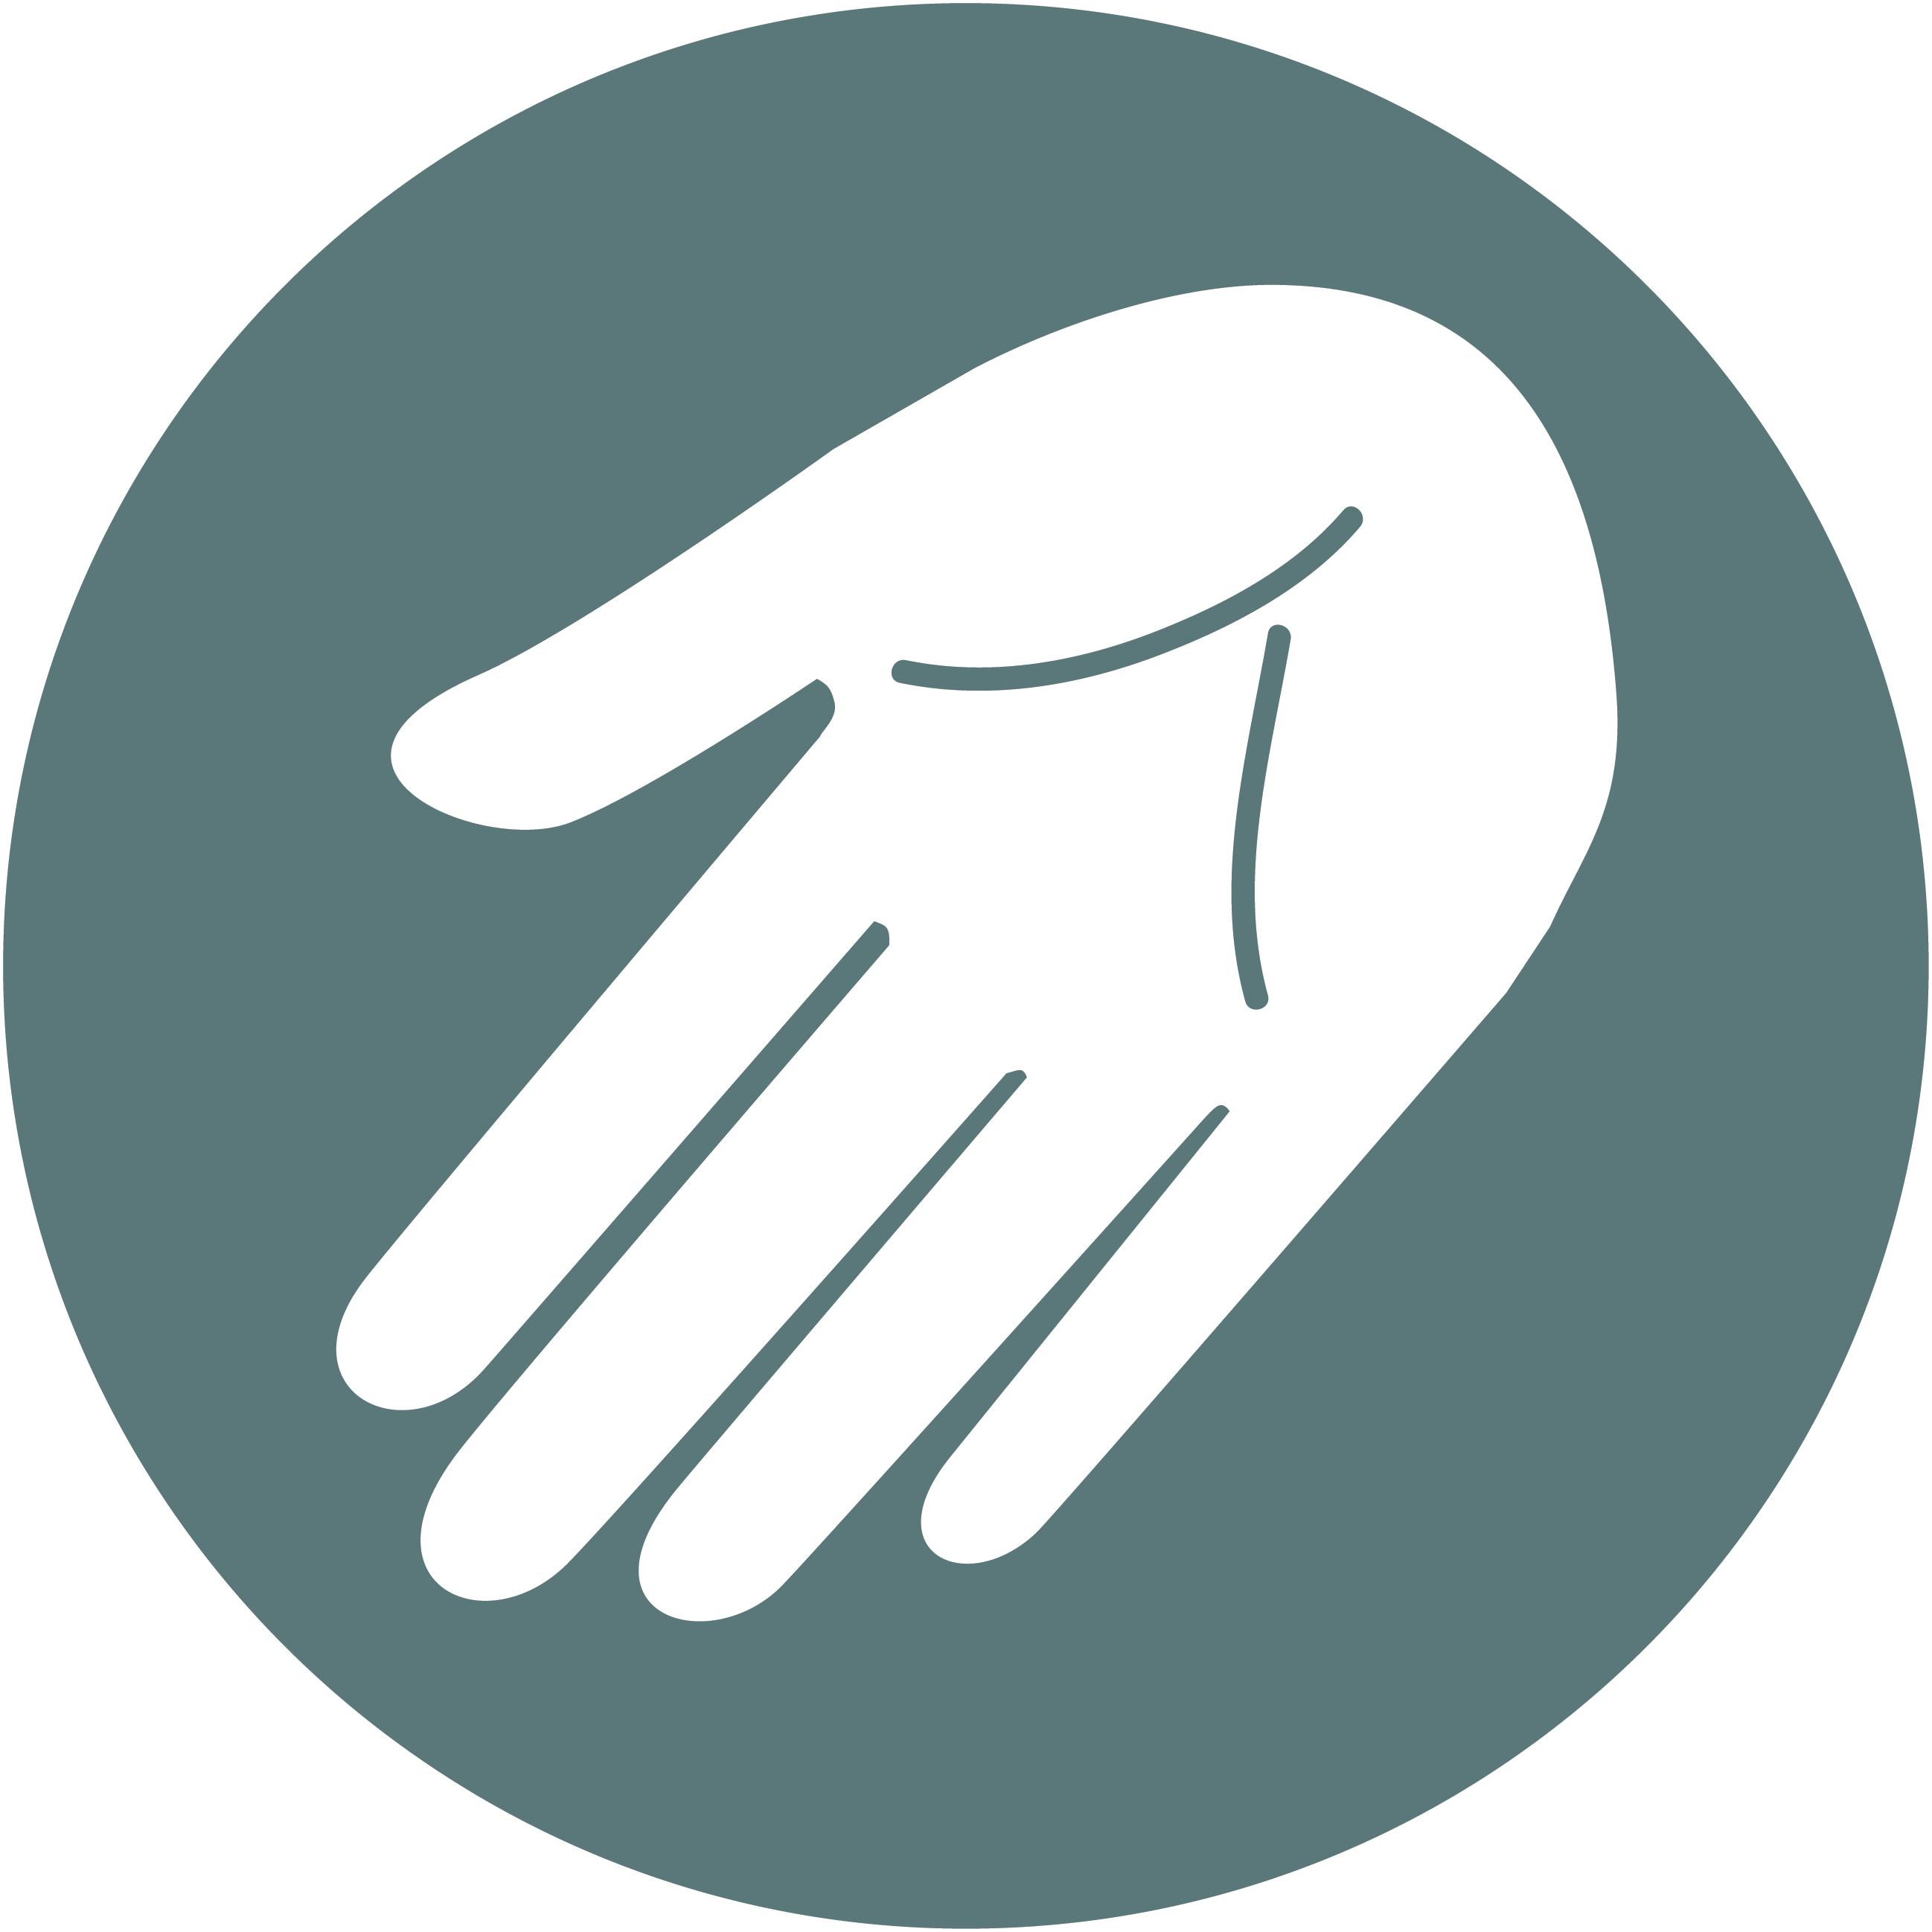 Helping Symbol